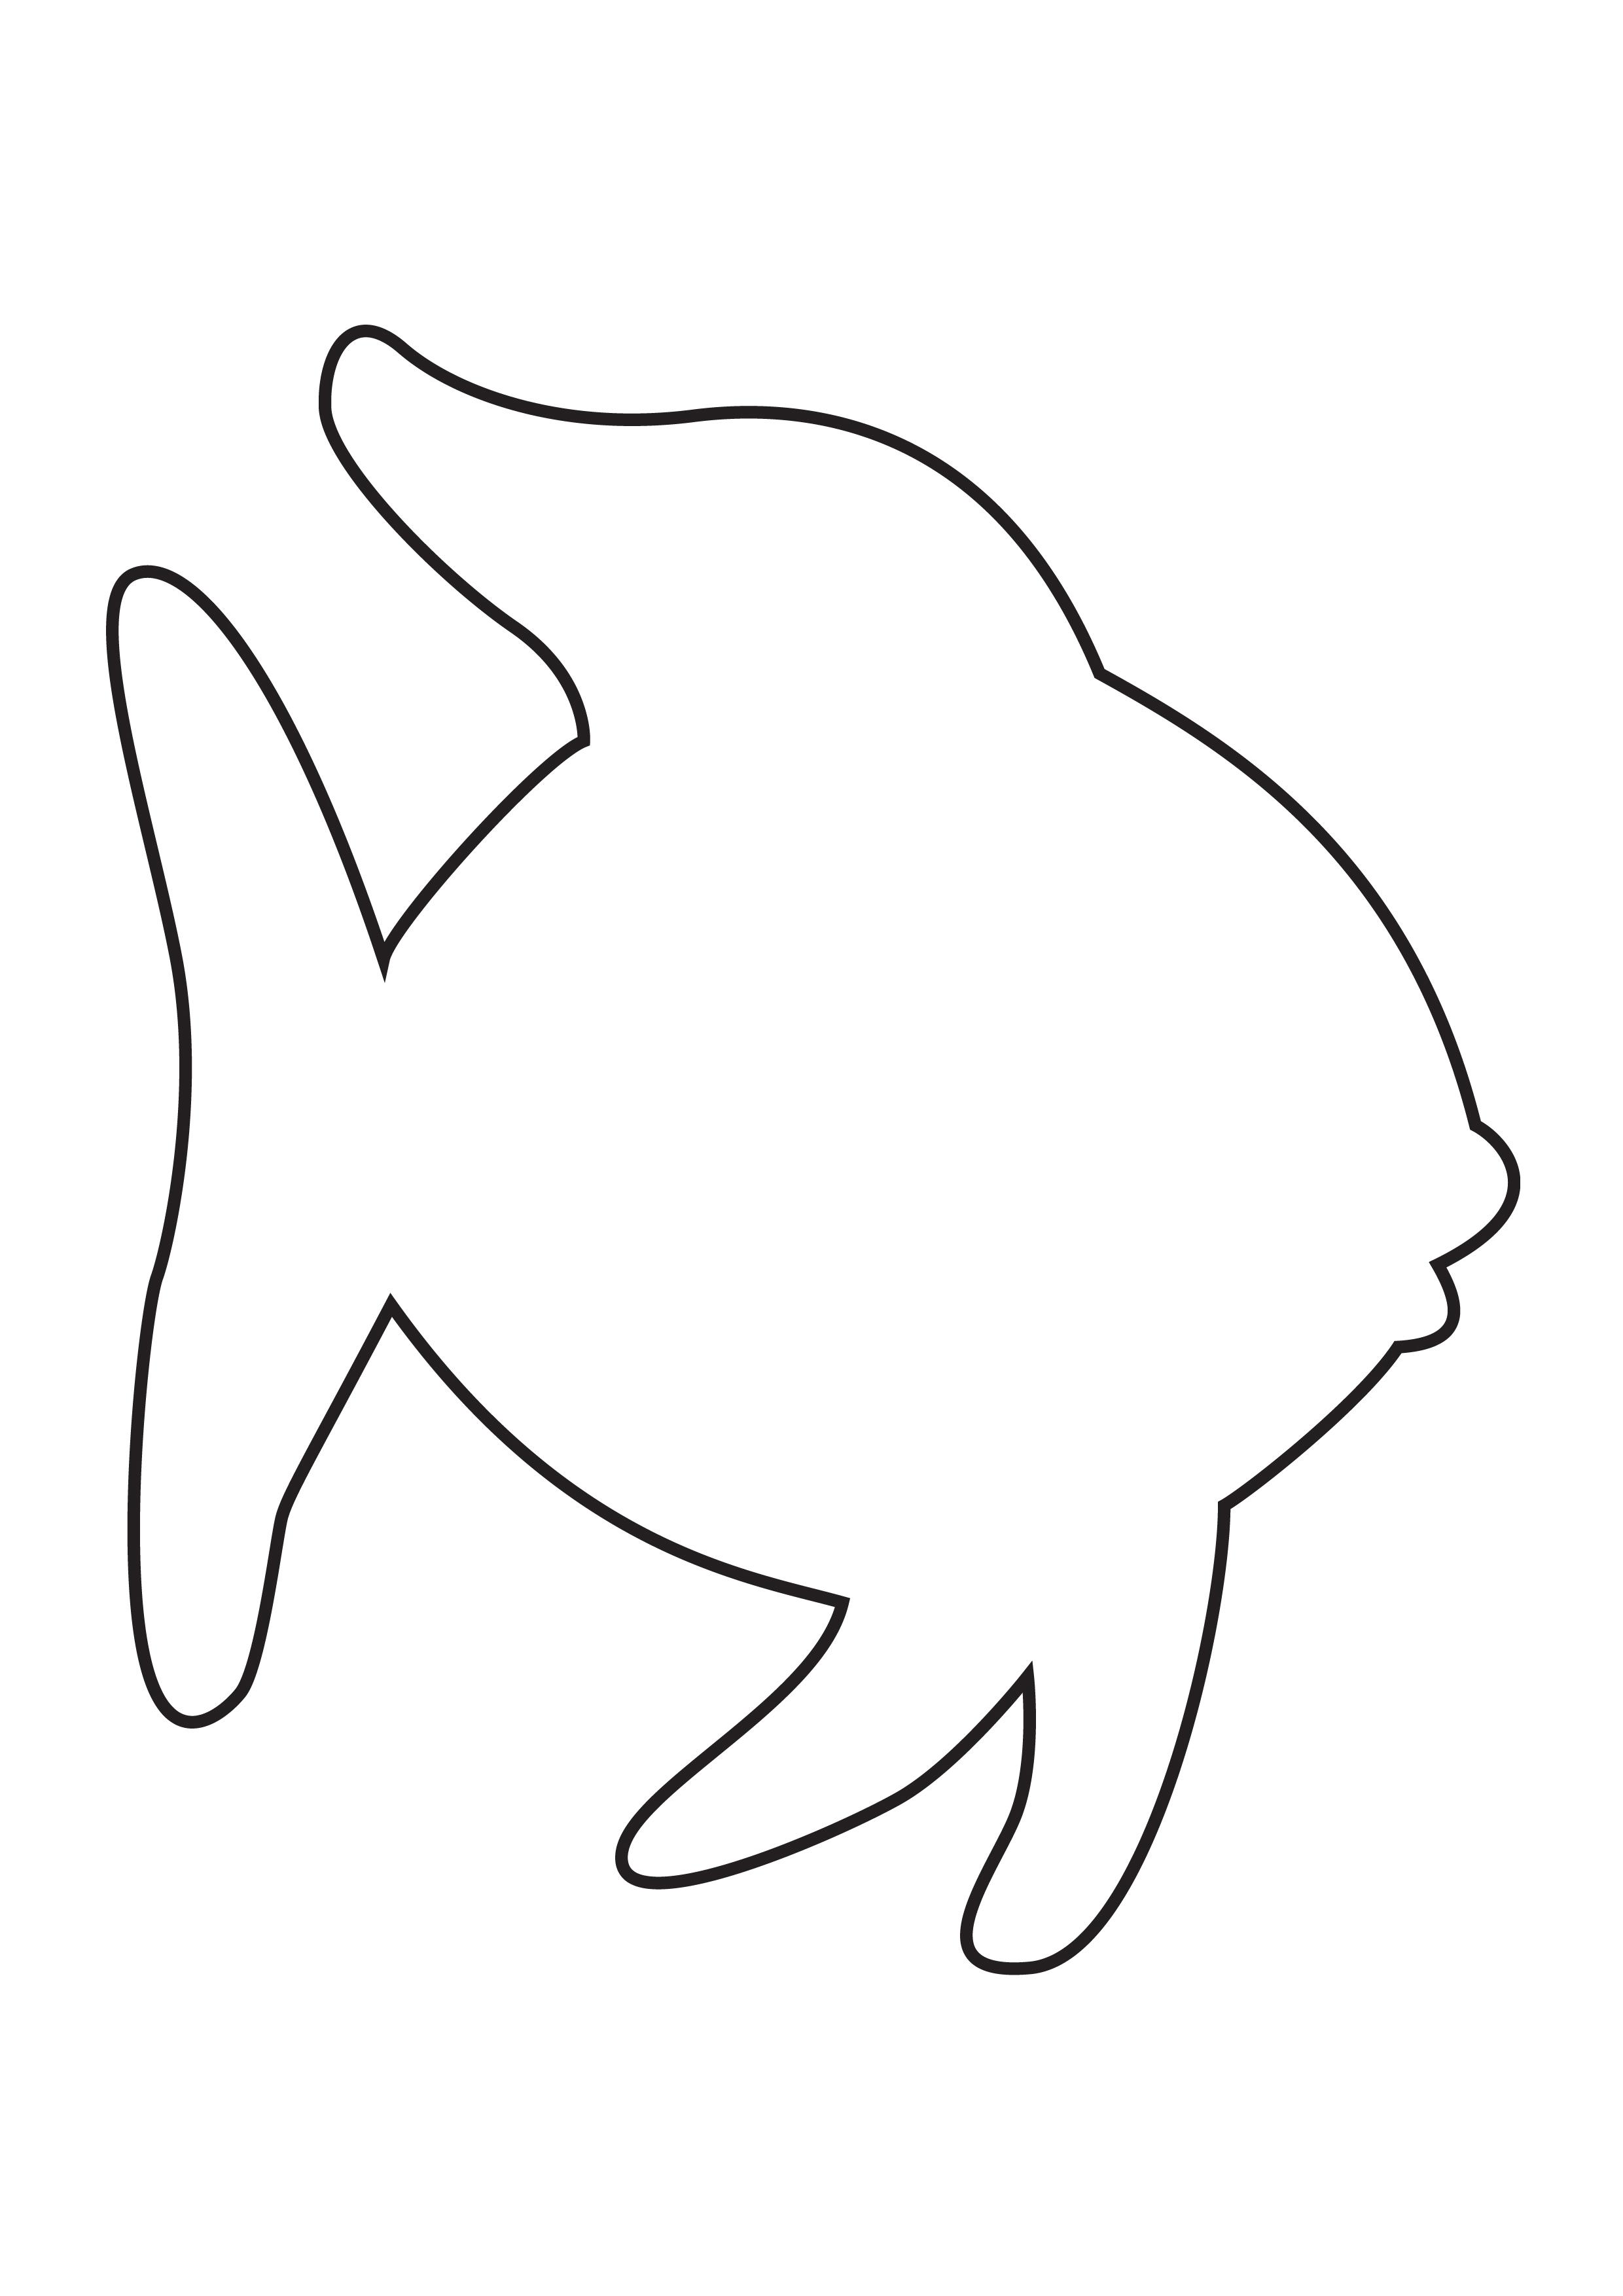 Clipart Fish Outline